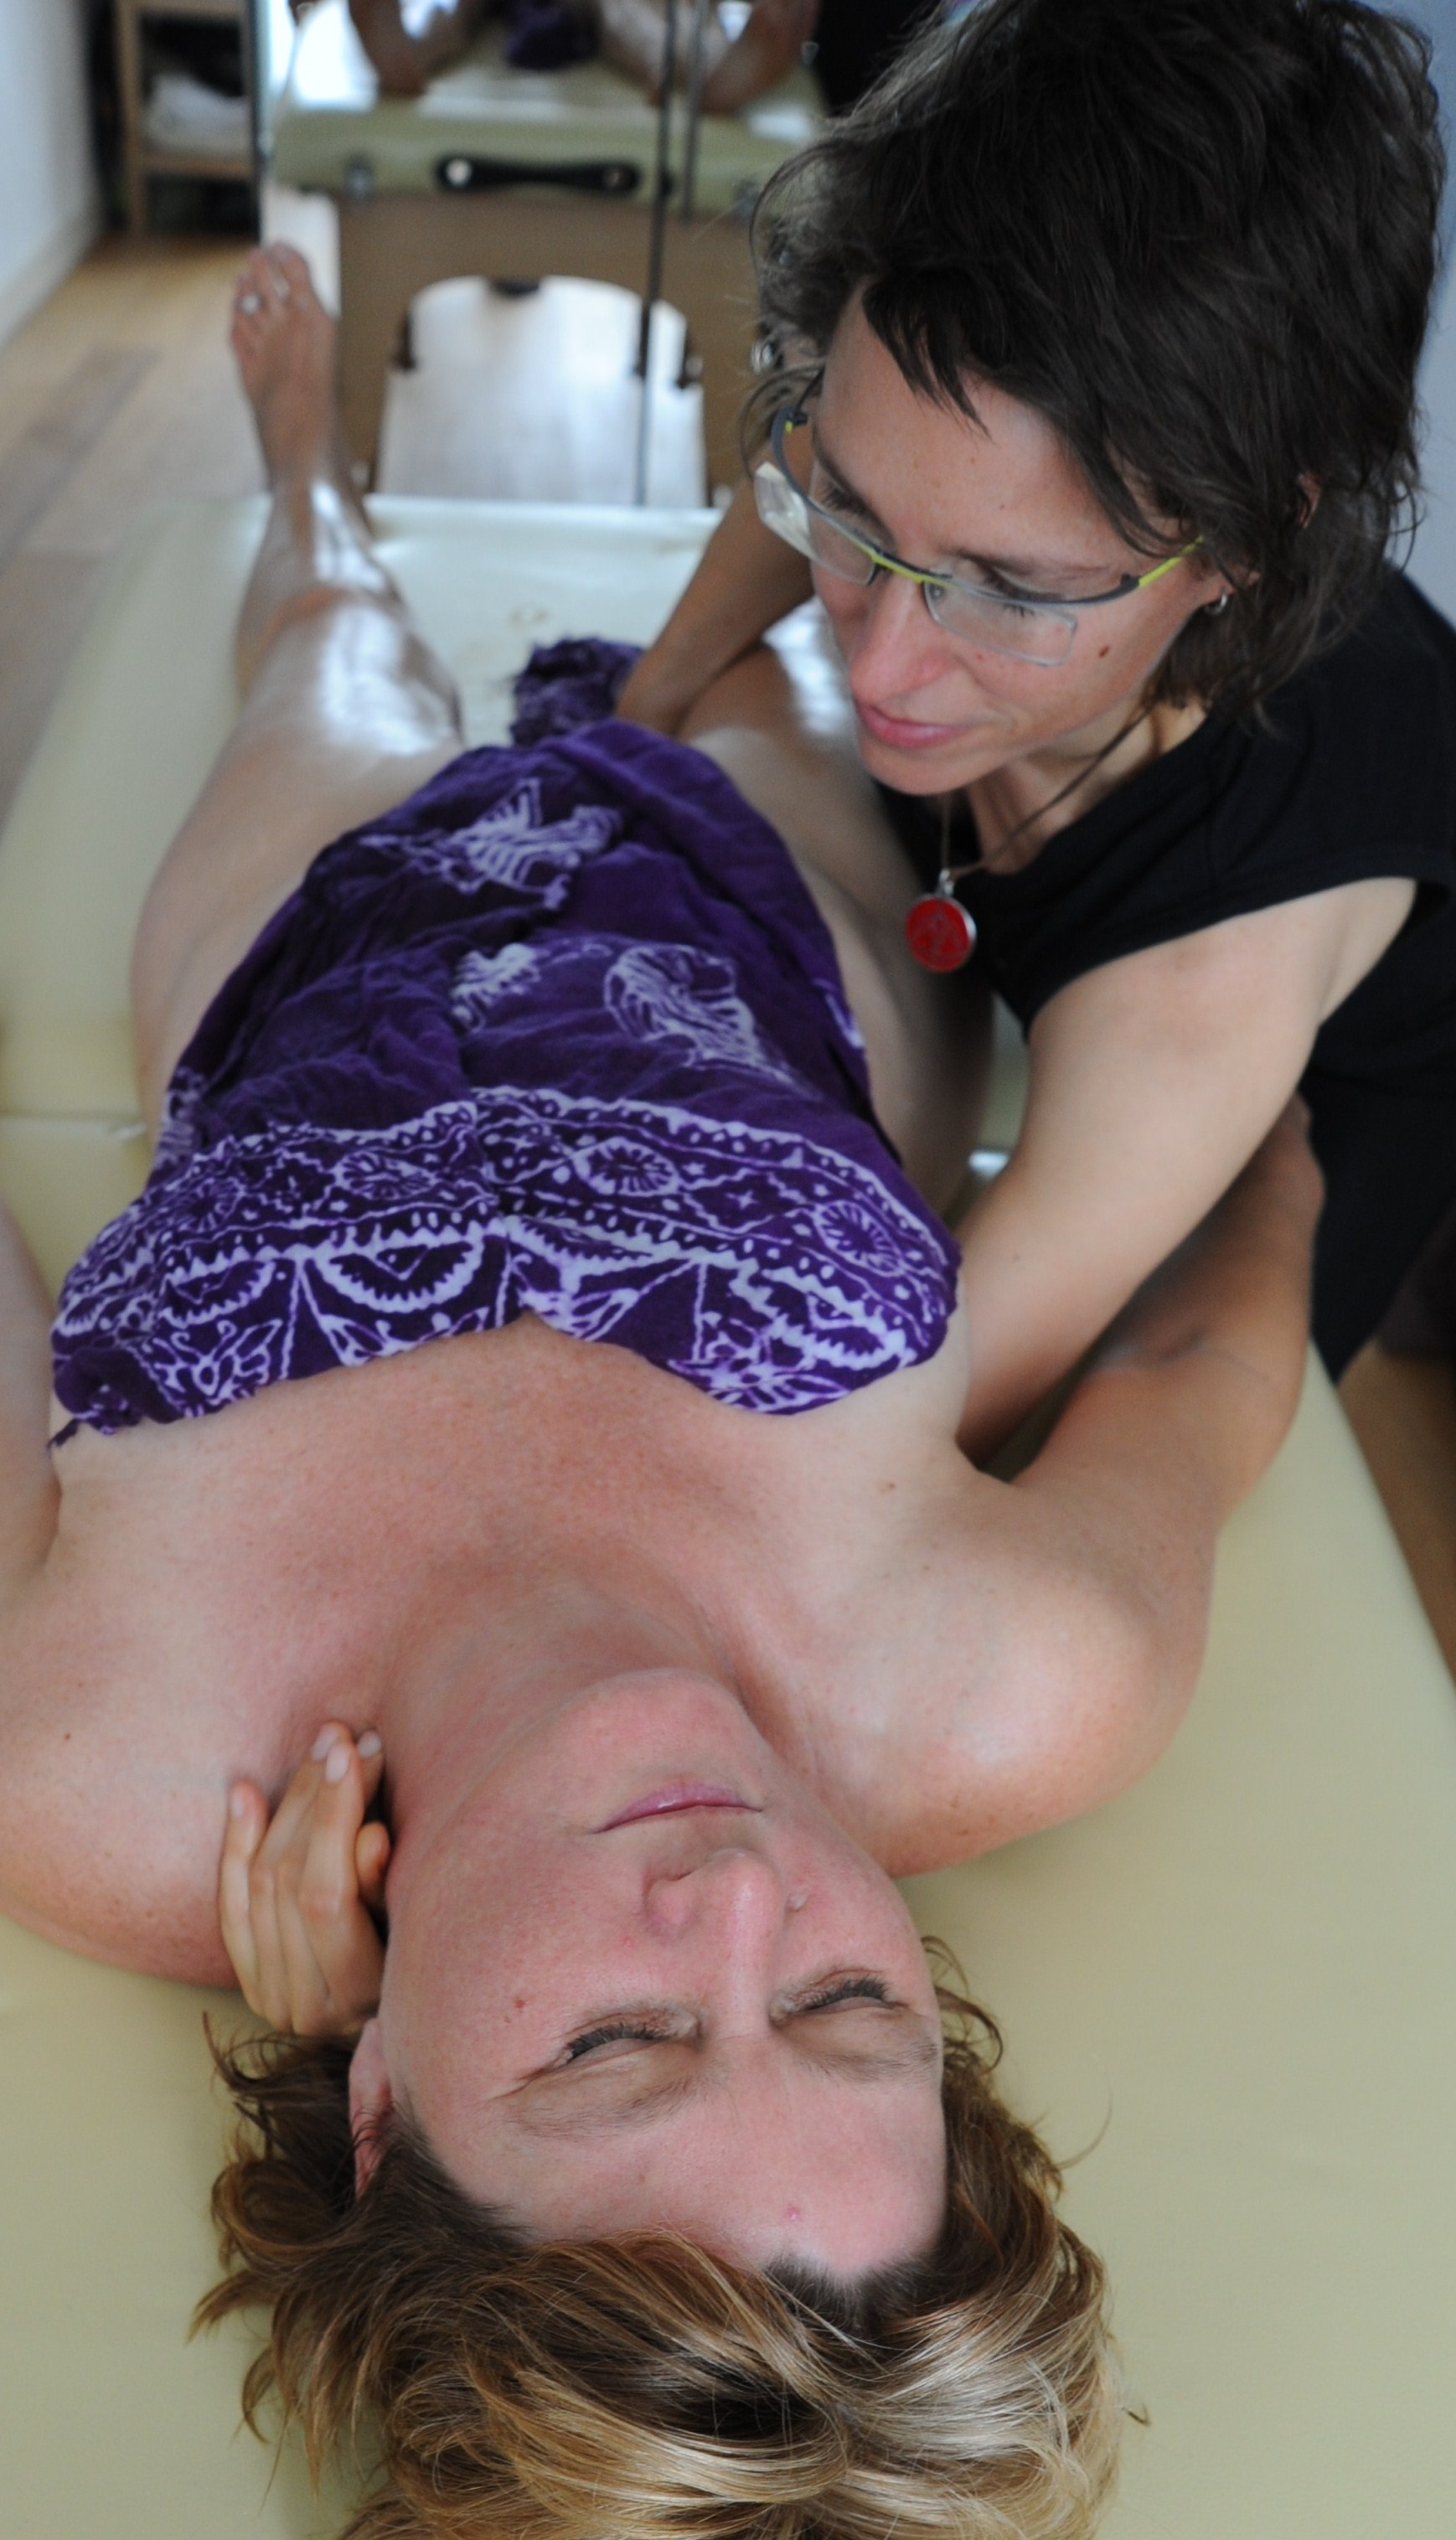 praat anoniem nl tantar massage